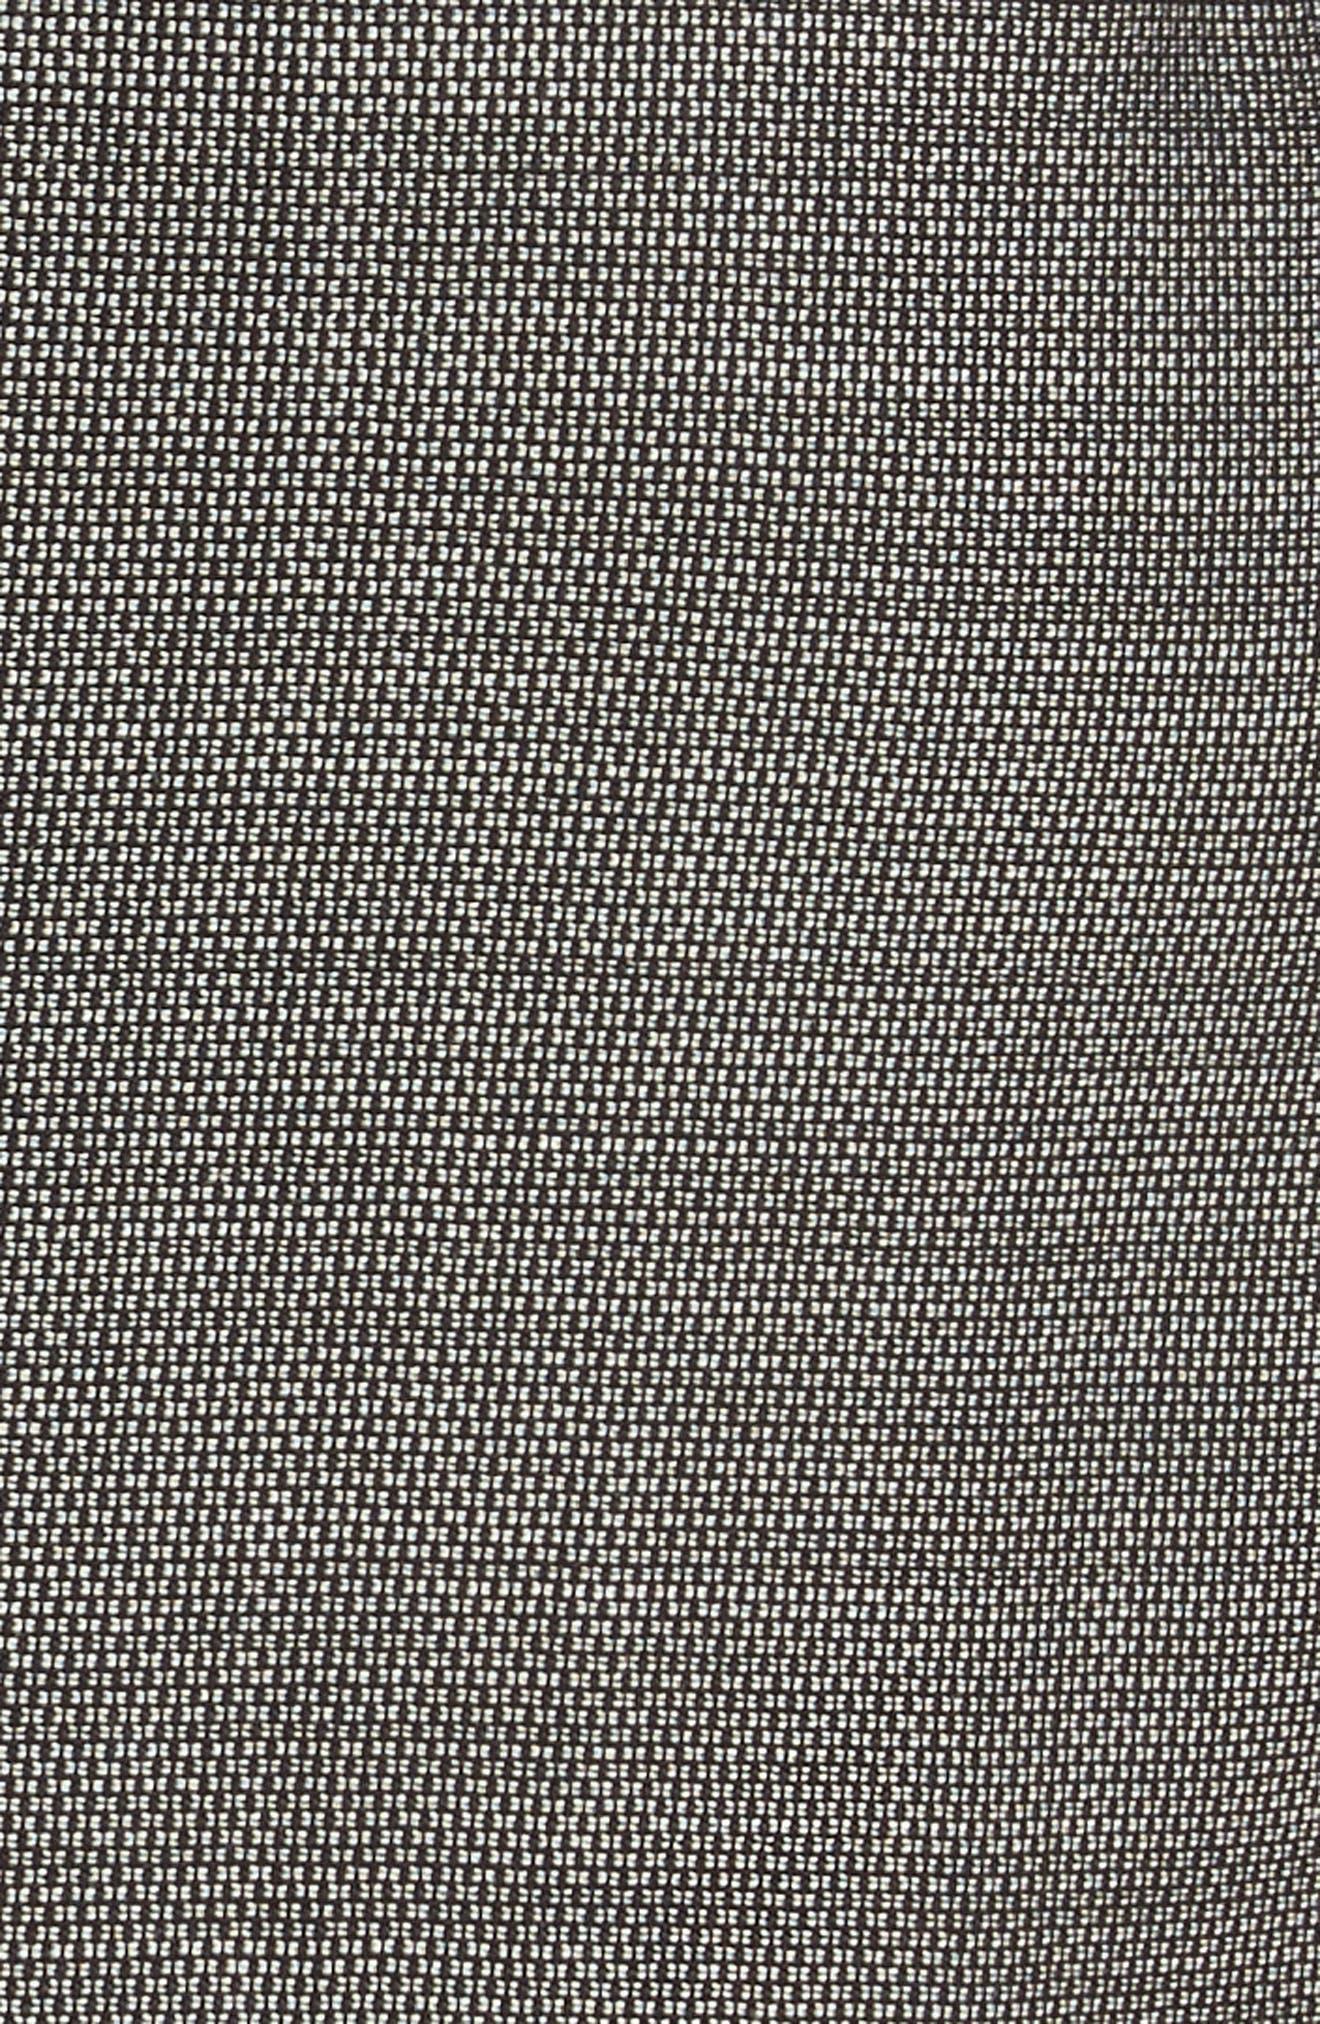 Canapa Stretch Wool Layered Sheath Dress,                             Alternate thumbnail 6, color,                             Black